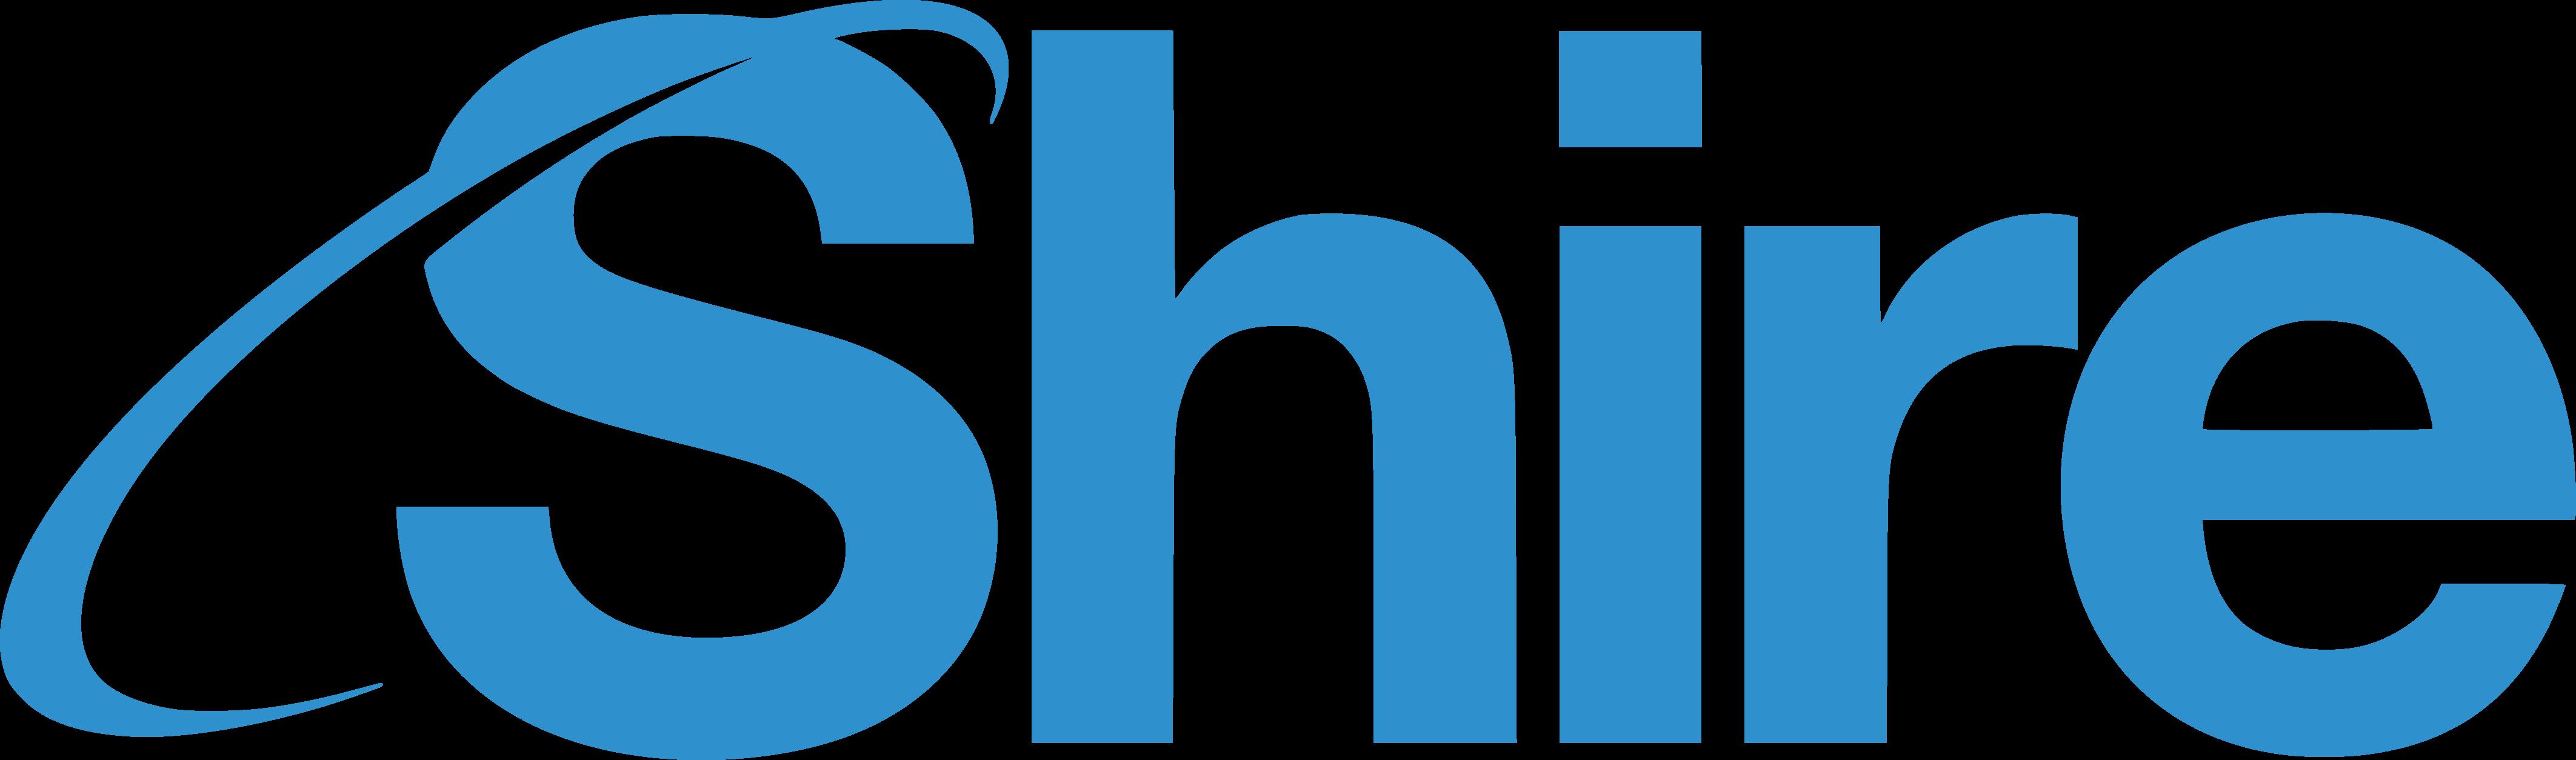 Shire Pharmaceuticals Logo